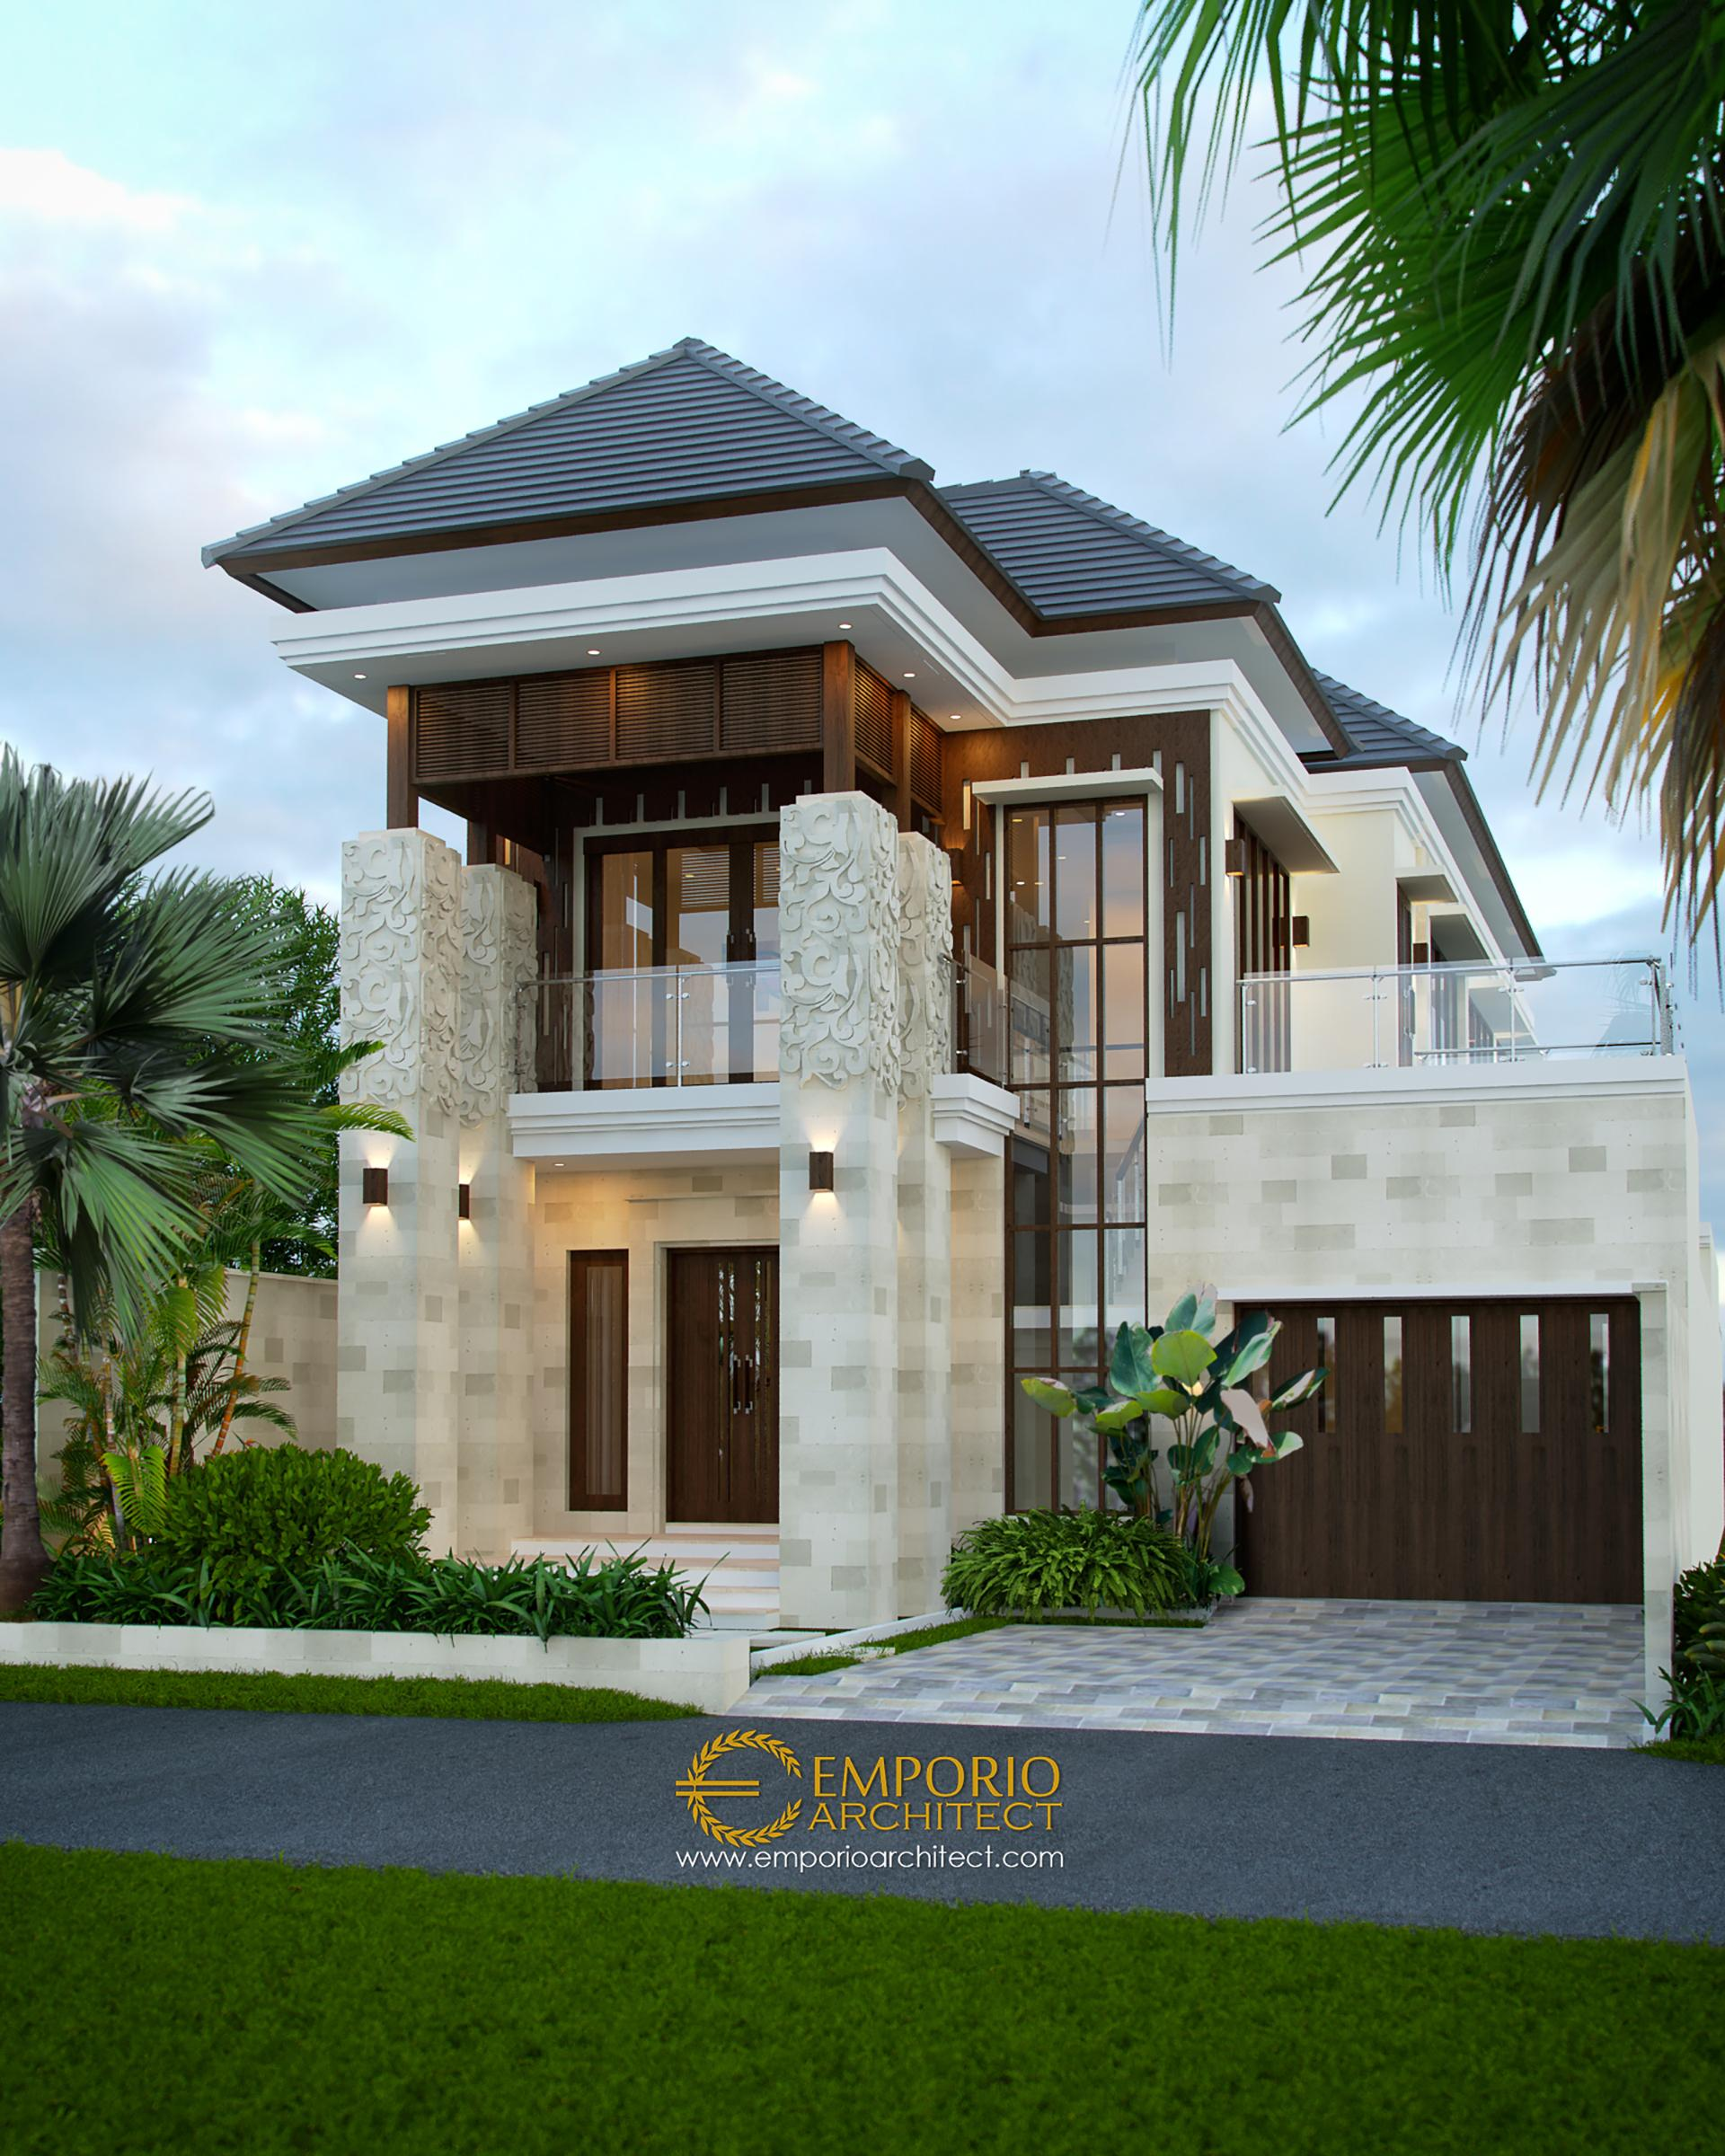 Desain Rumah Villa Bali 2 Lantai Ibu Rina di Lampung